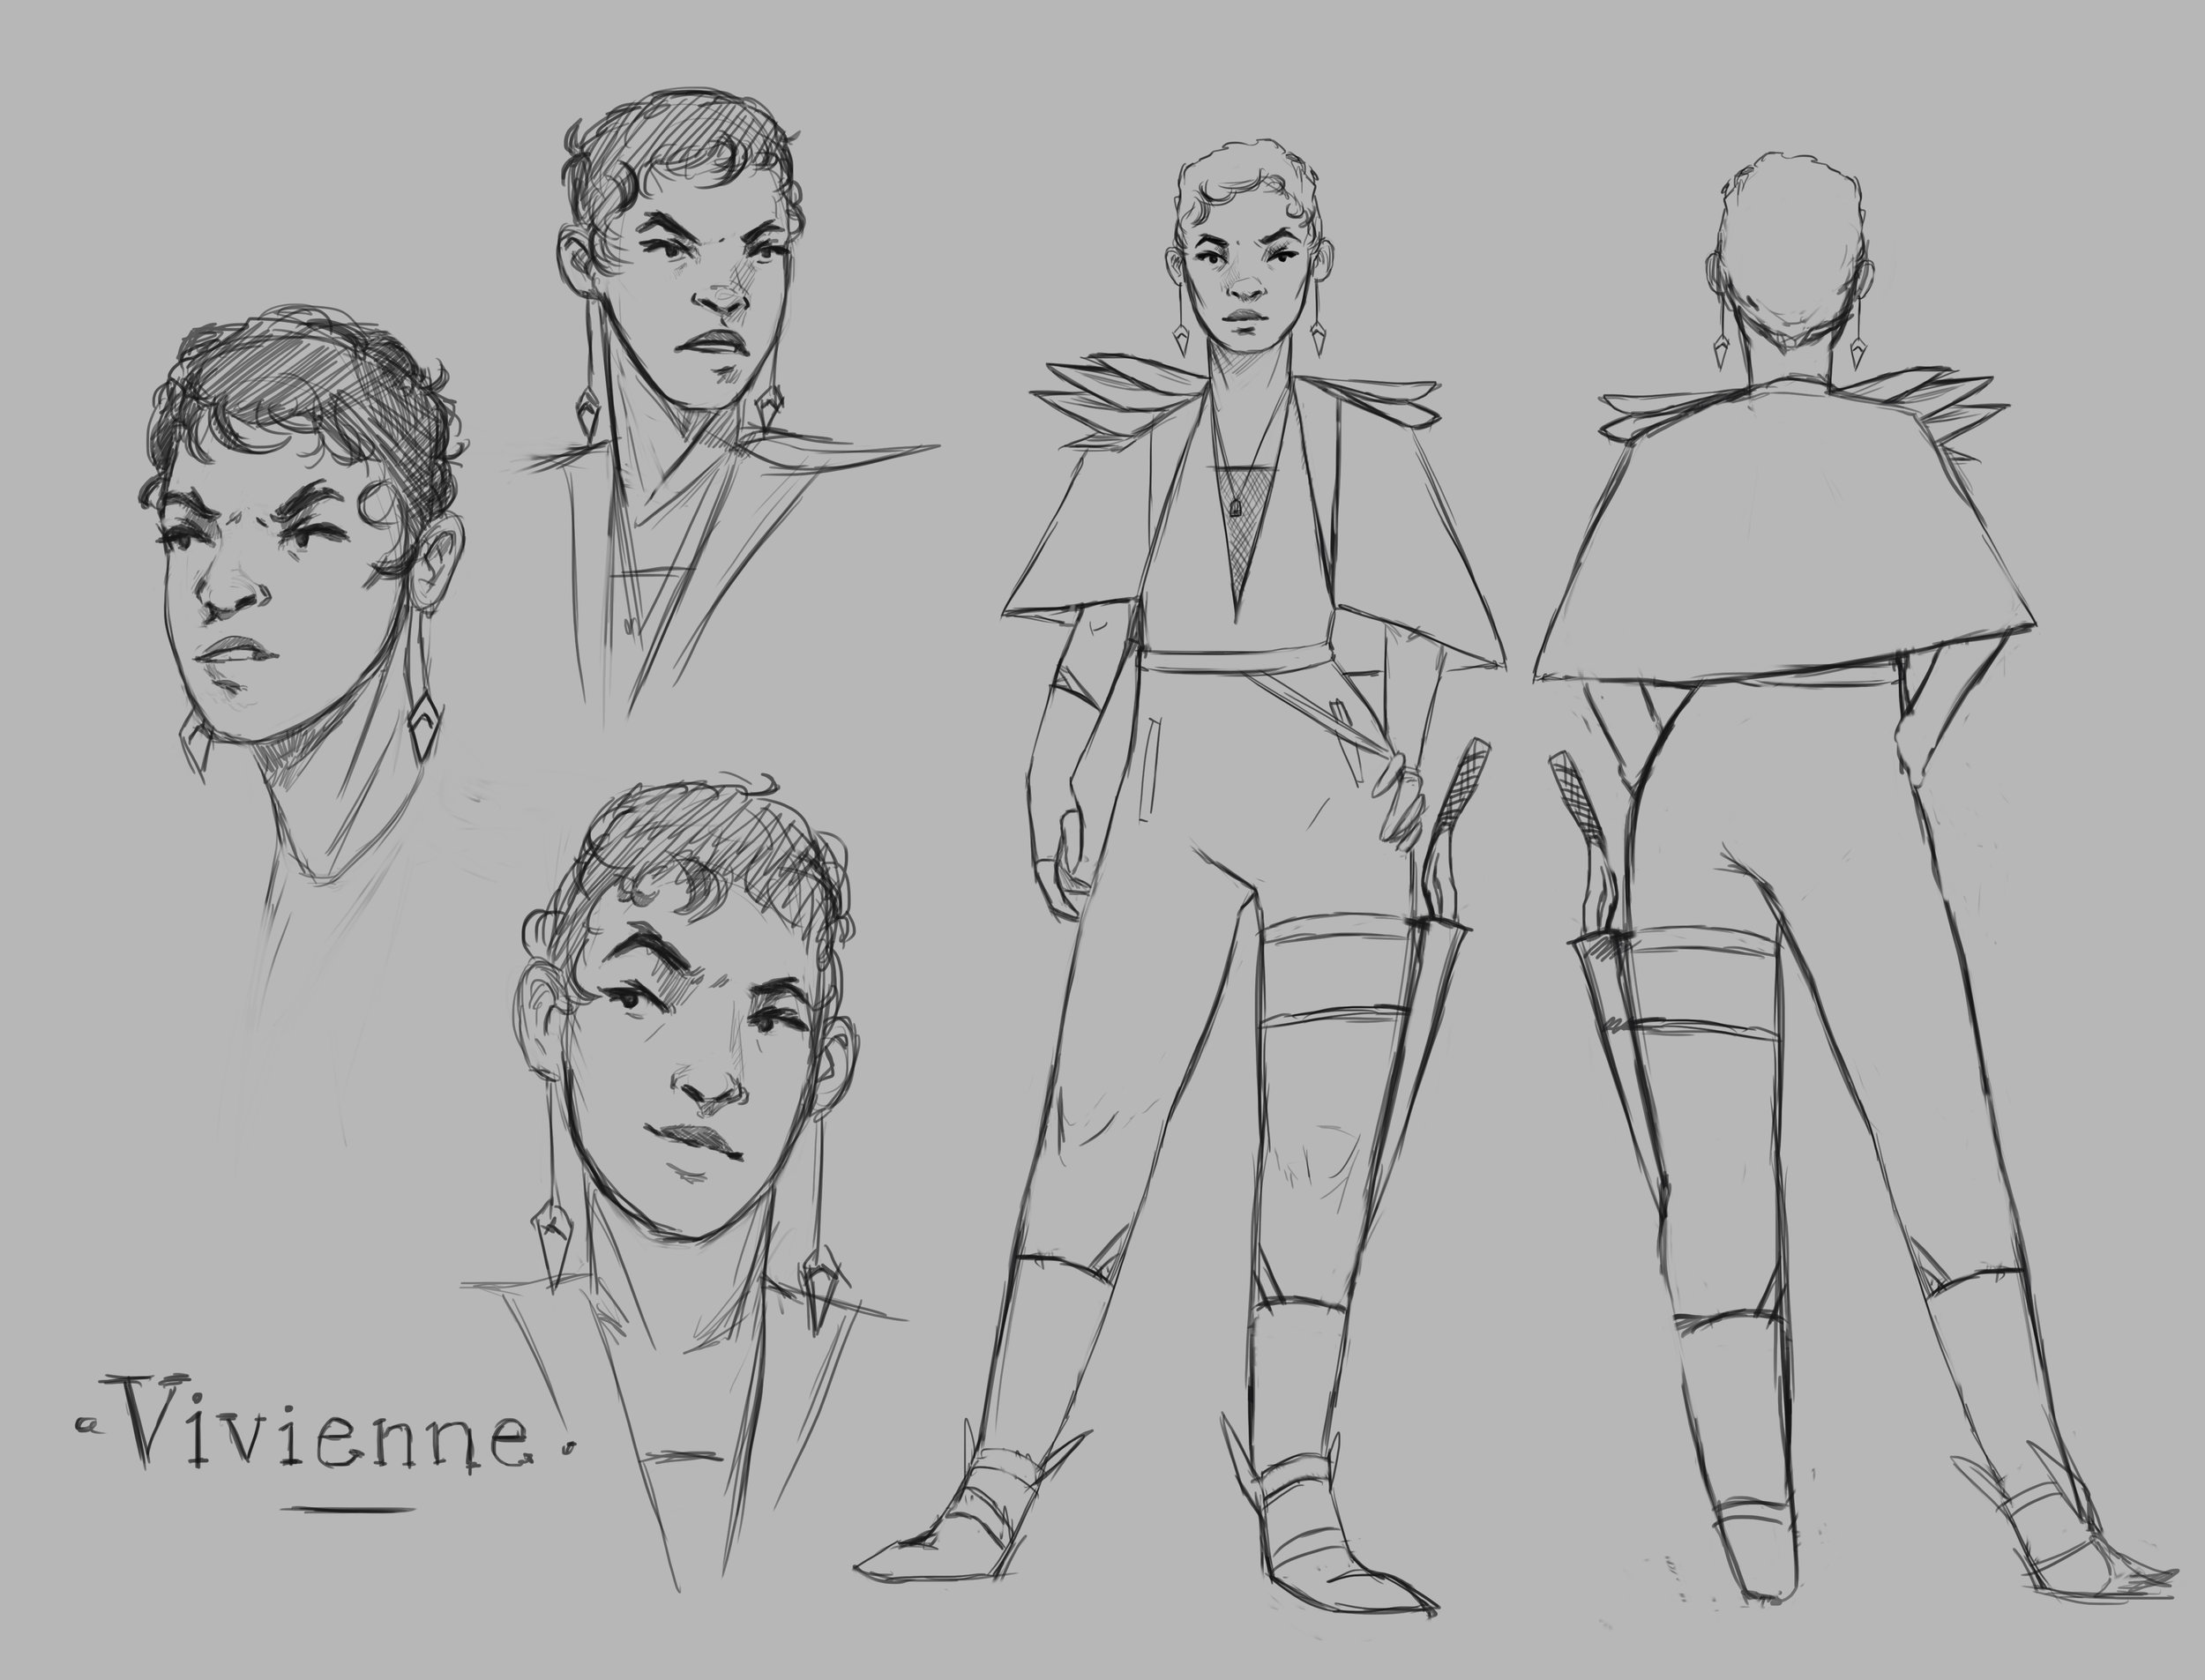 Vivienne character sheet